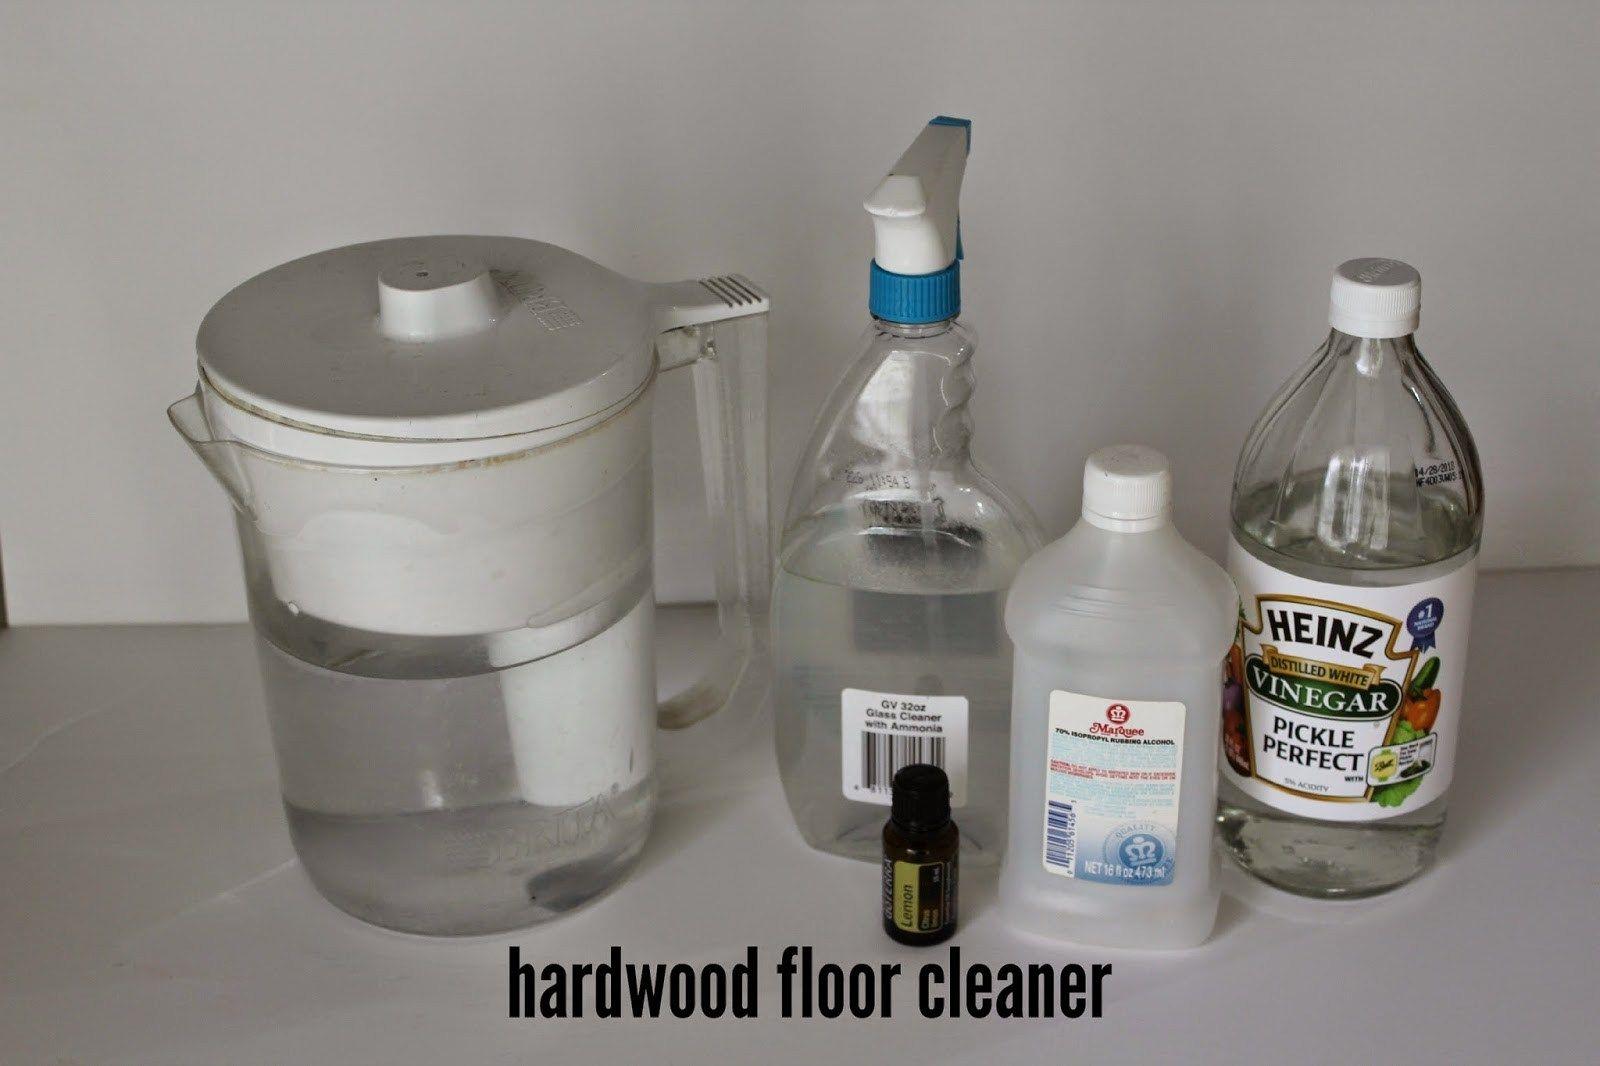 6 Pics Hardwood Floor Cleaner With Vinegar And Description